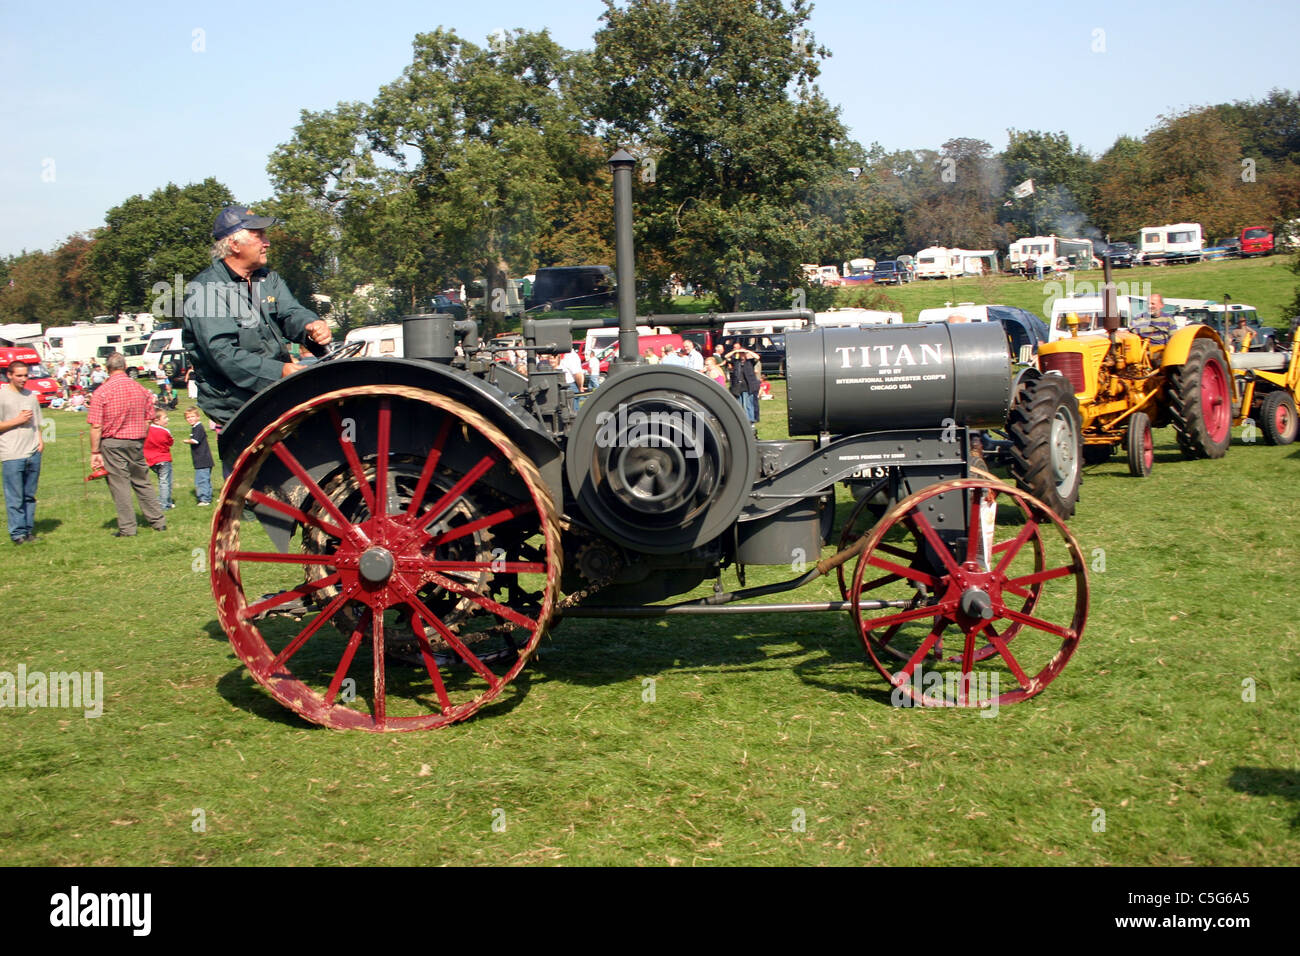 1919 International Titan tractor at 2006 YesterYear Rally Hampton Malpas Cheshire England - Stock Image